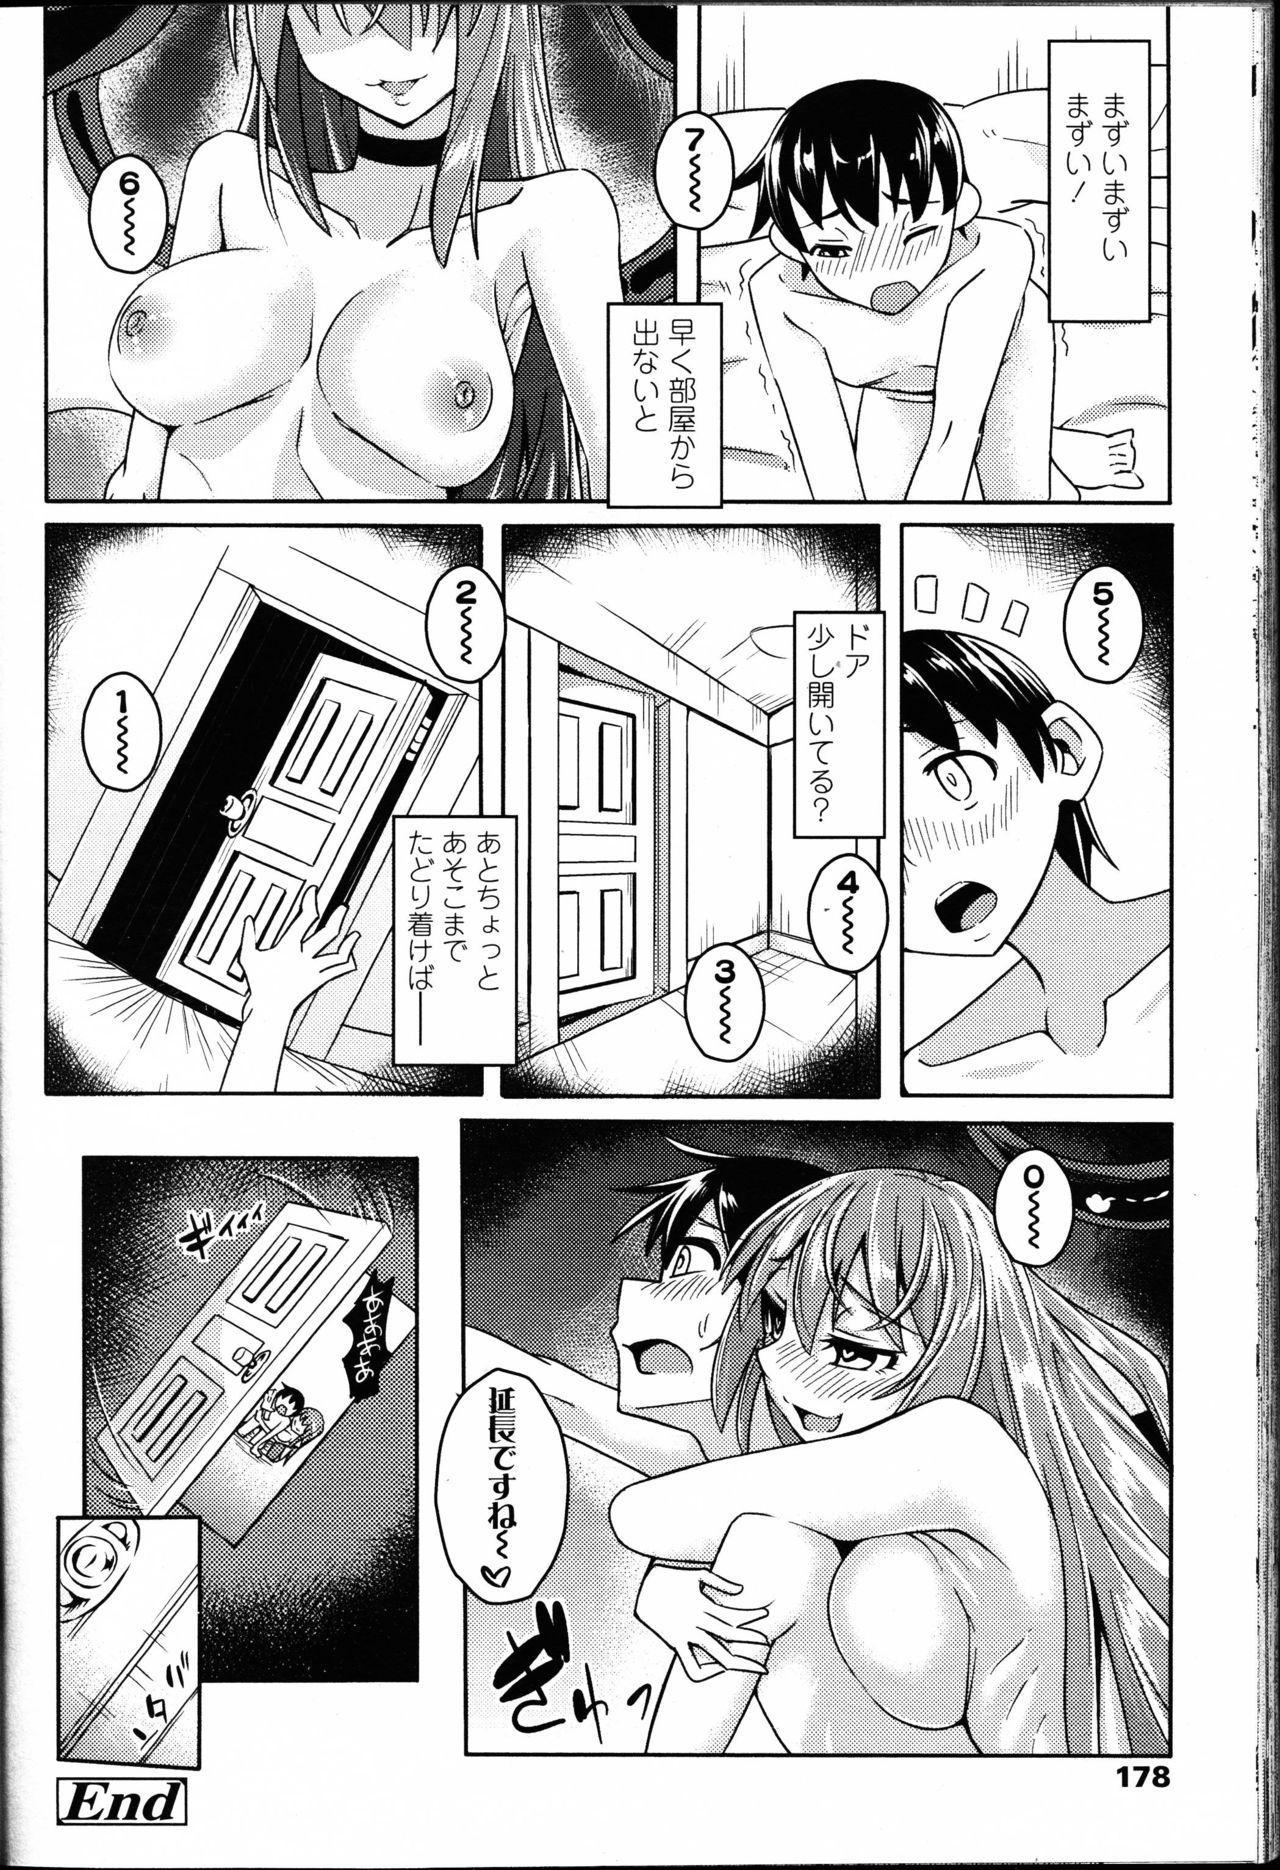 Girls forM Vol. 14 177